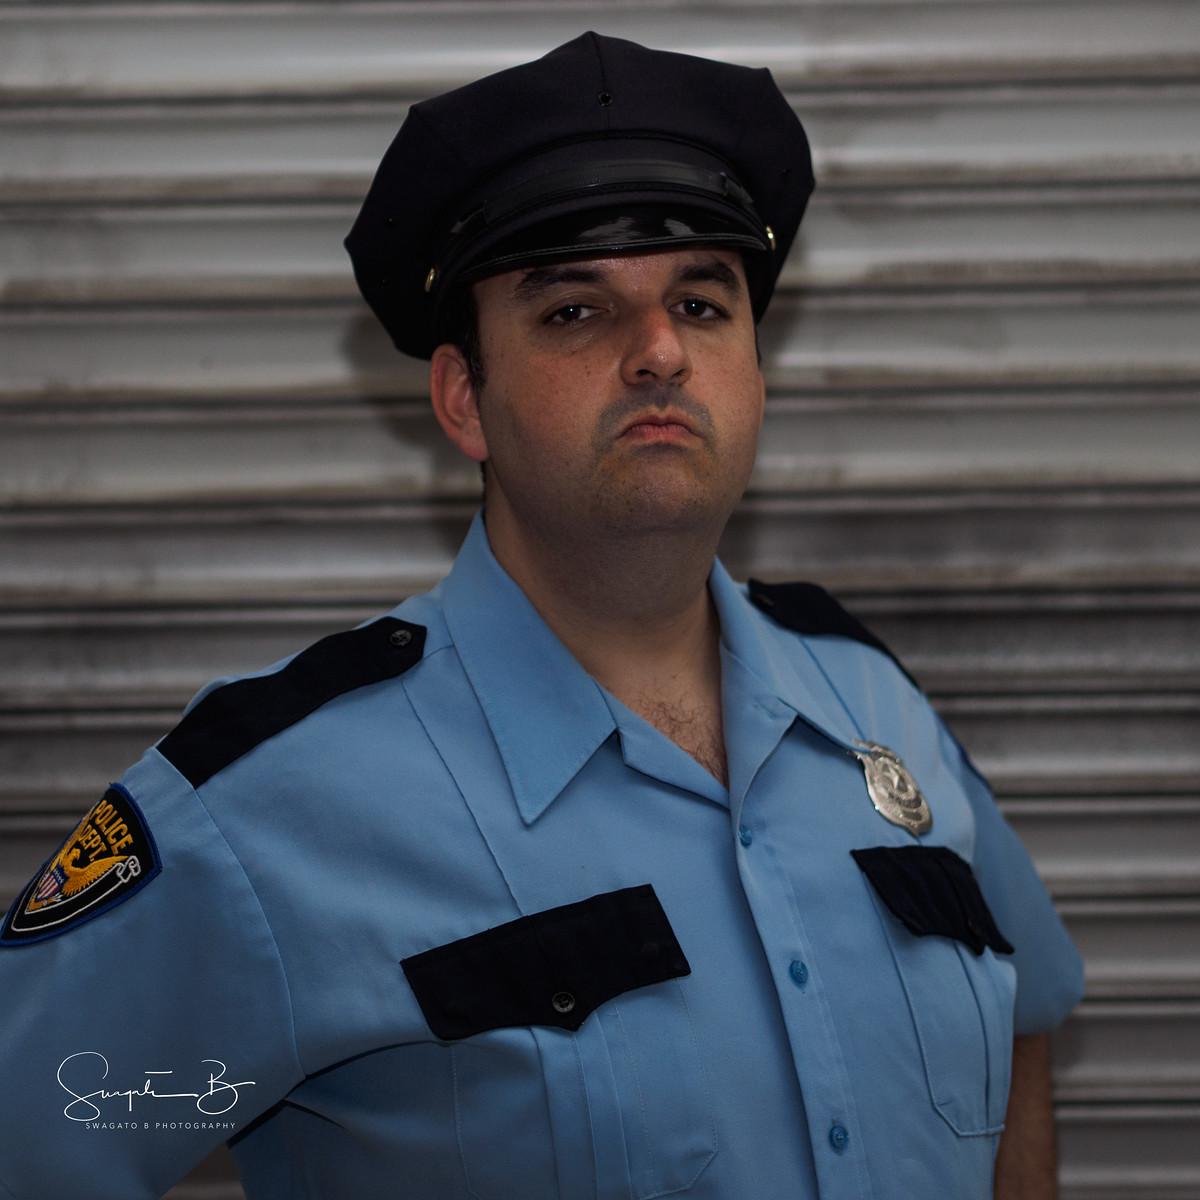 François-Fabien Ferhani as Officer Alex Martin – enemy or protector?